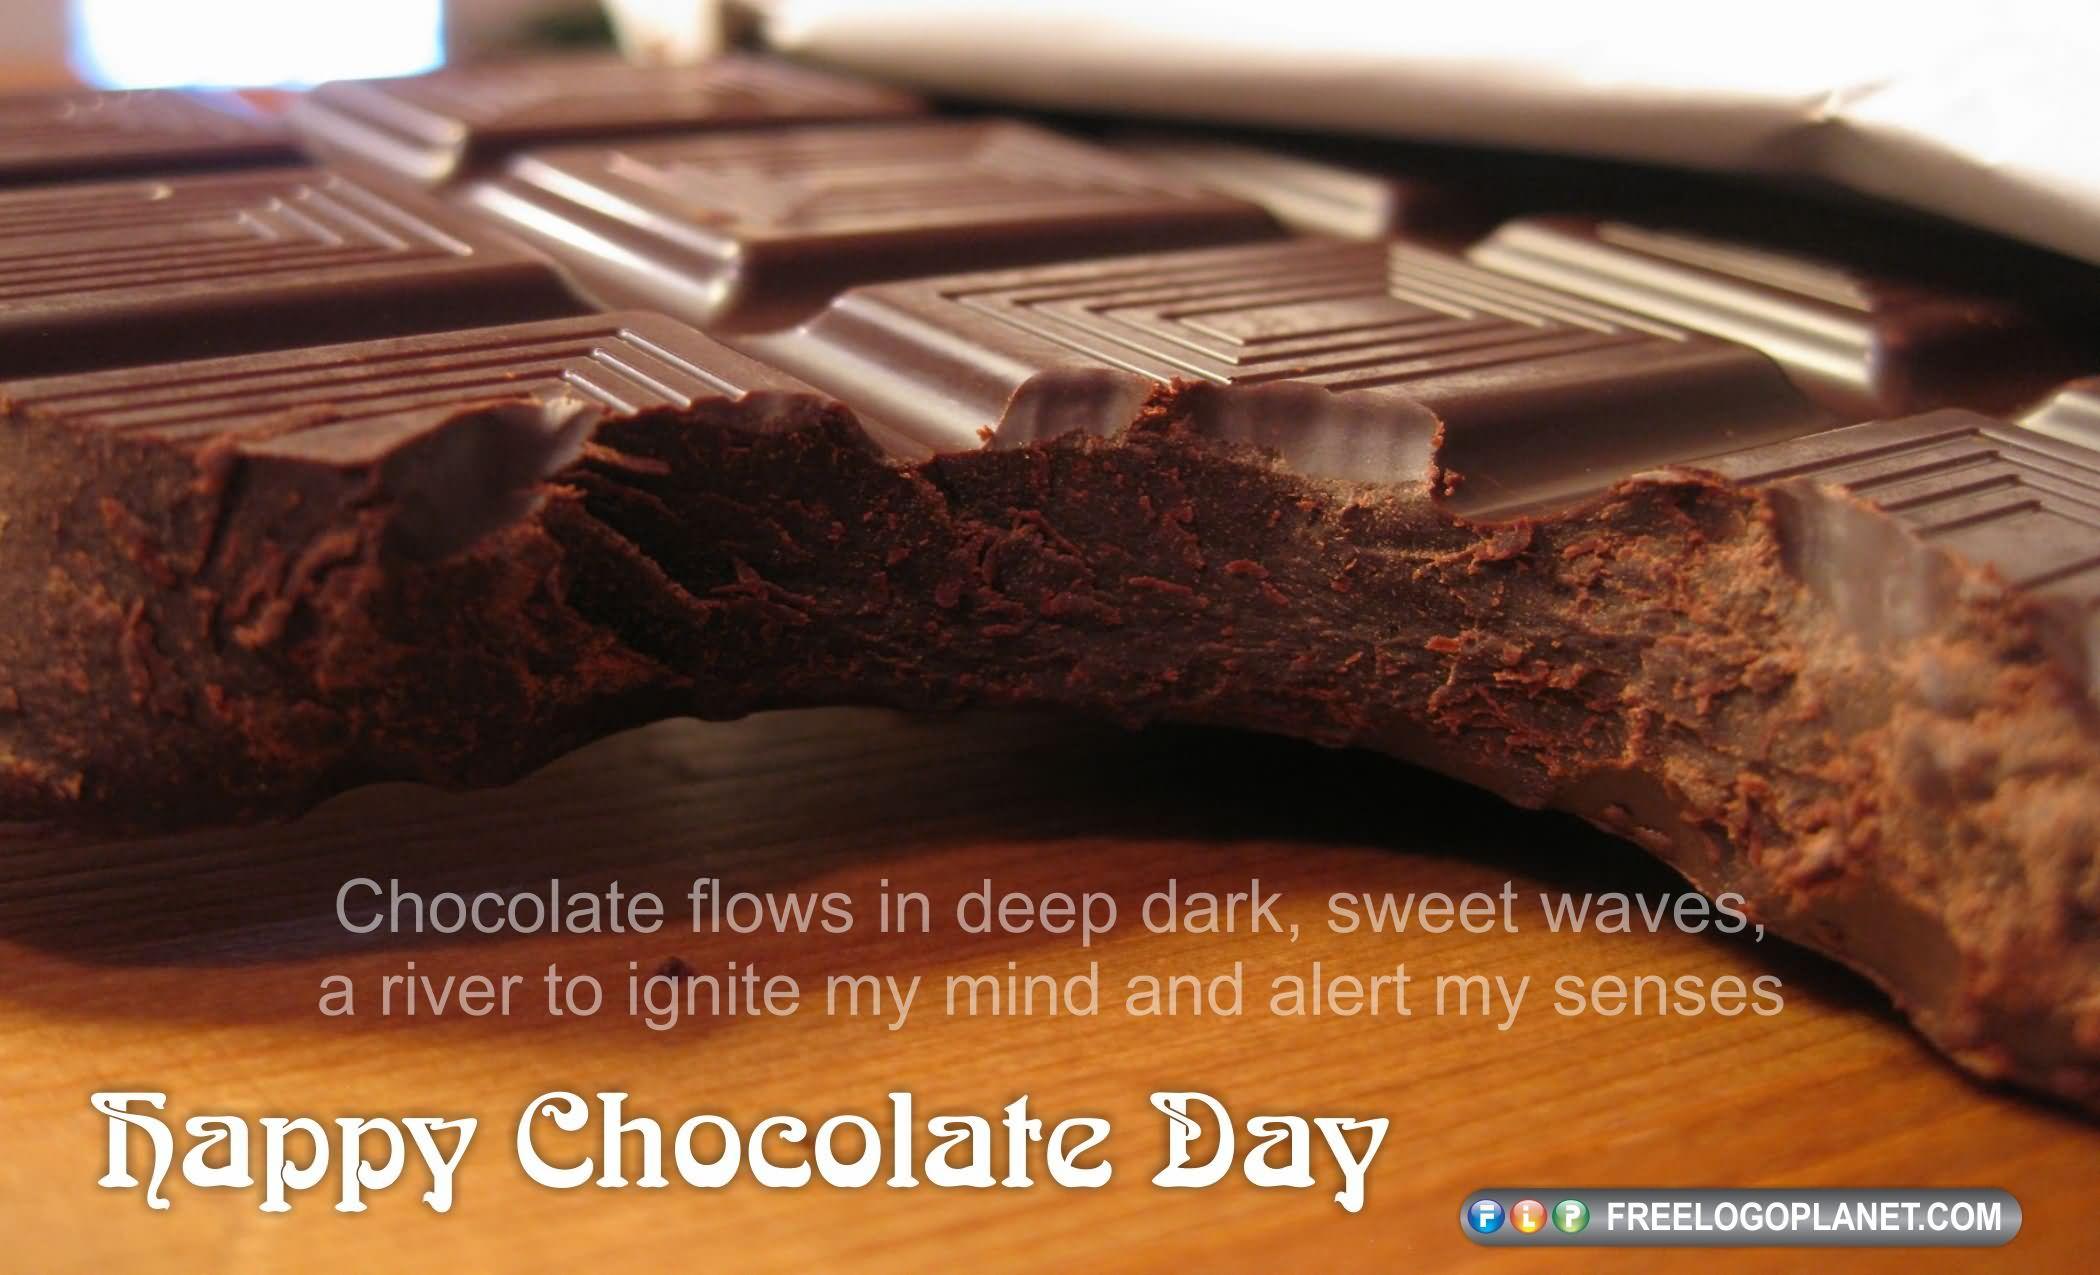 Happy Chocolate Day 2017 Chocolates In Heart Box